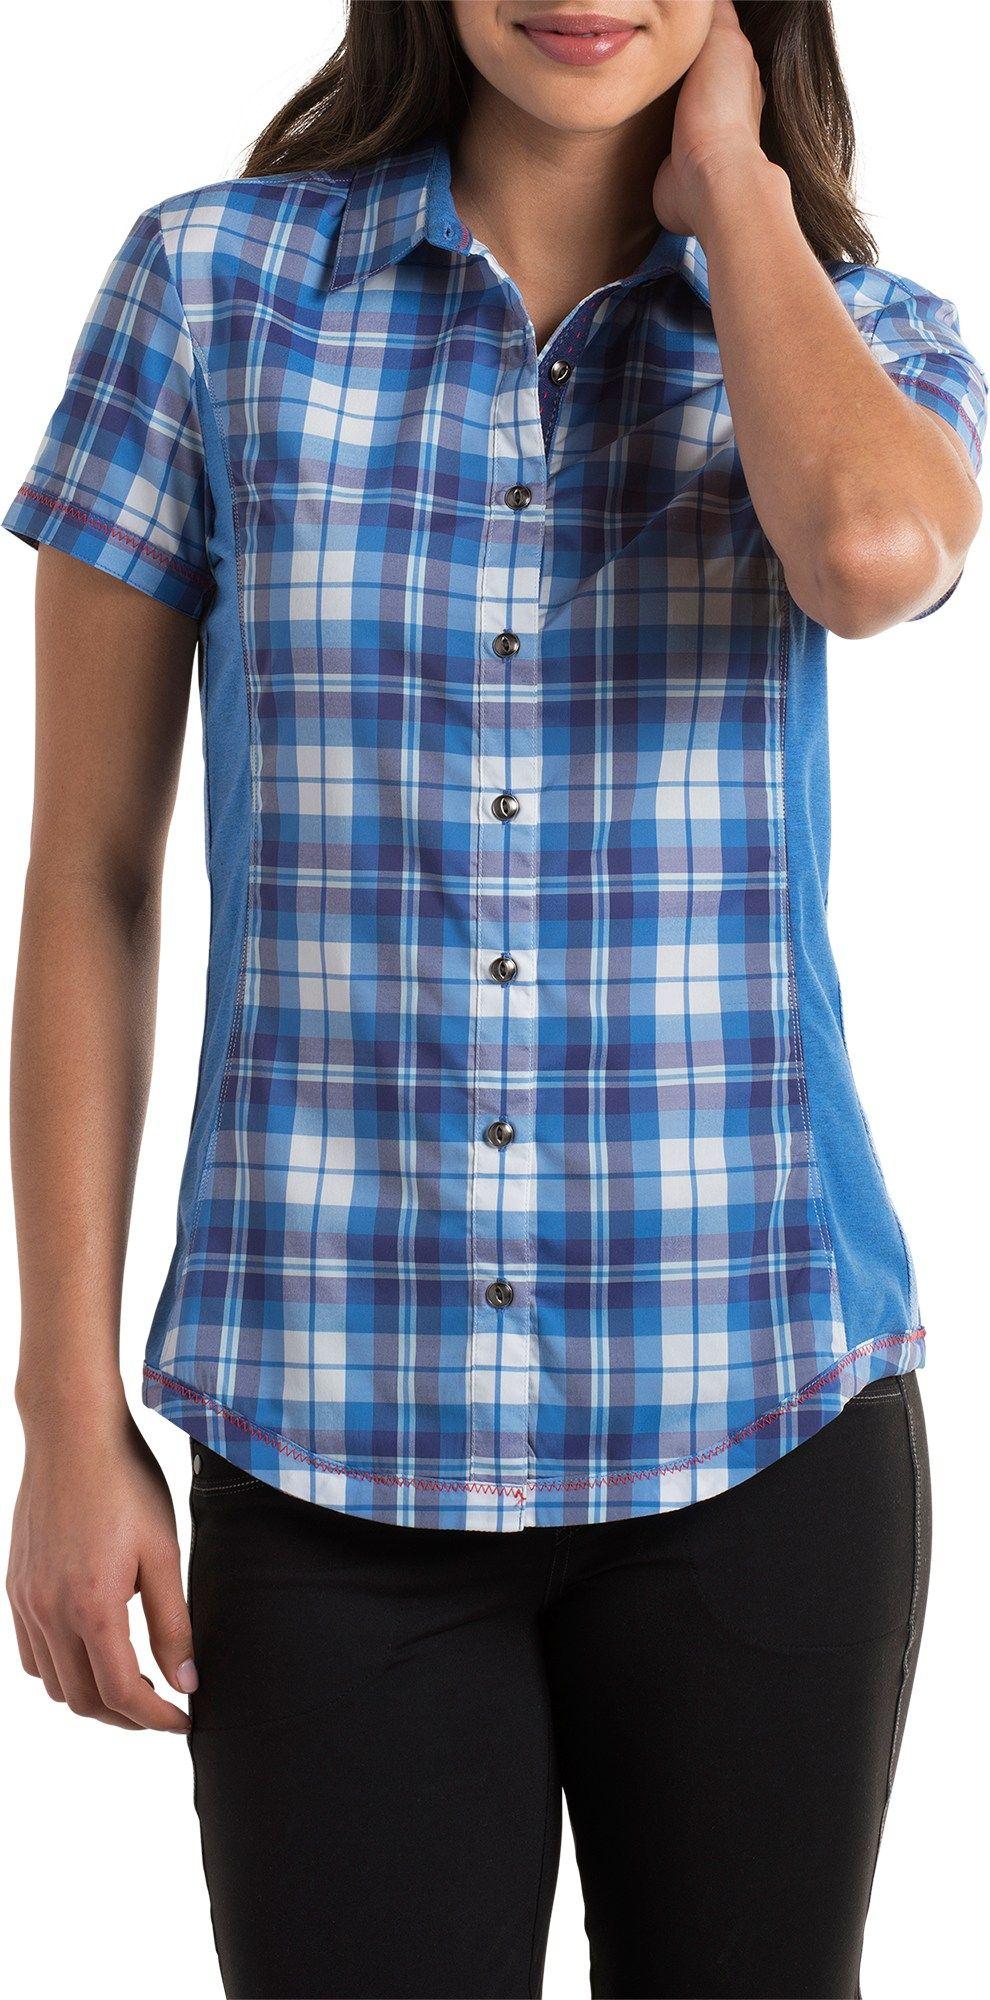 Flannel shirt apron  Kuhl Suono Shirt  Womenus  Fashion  Pinterest  Clothes and Fashion